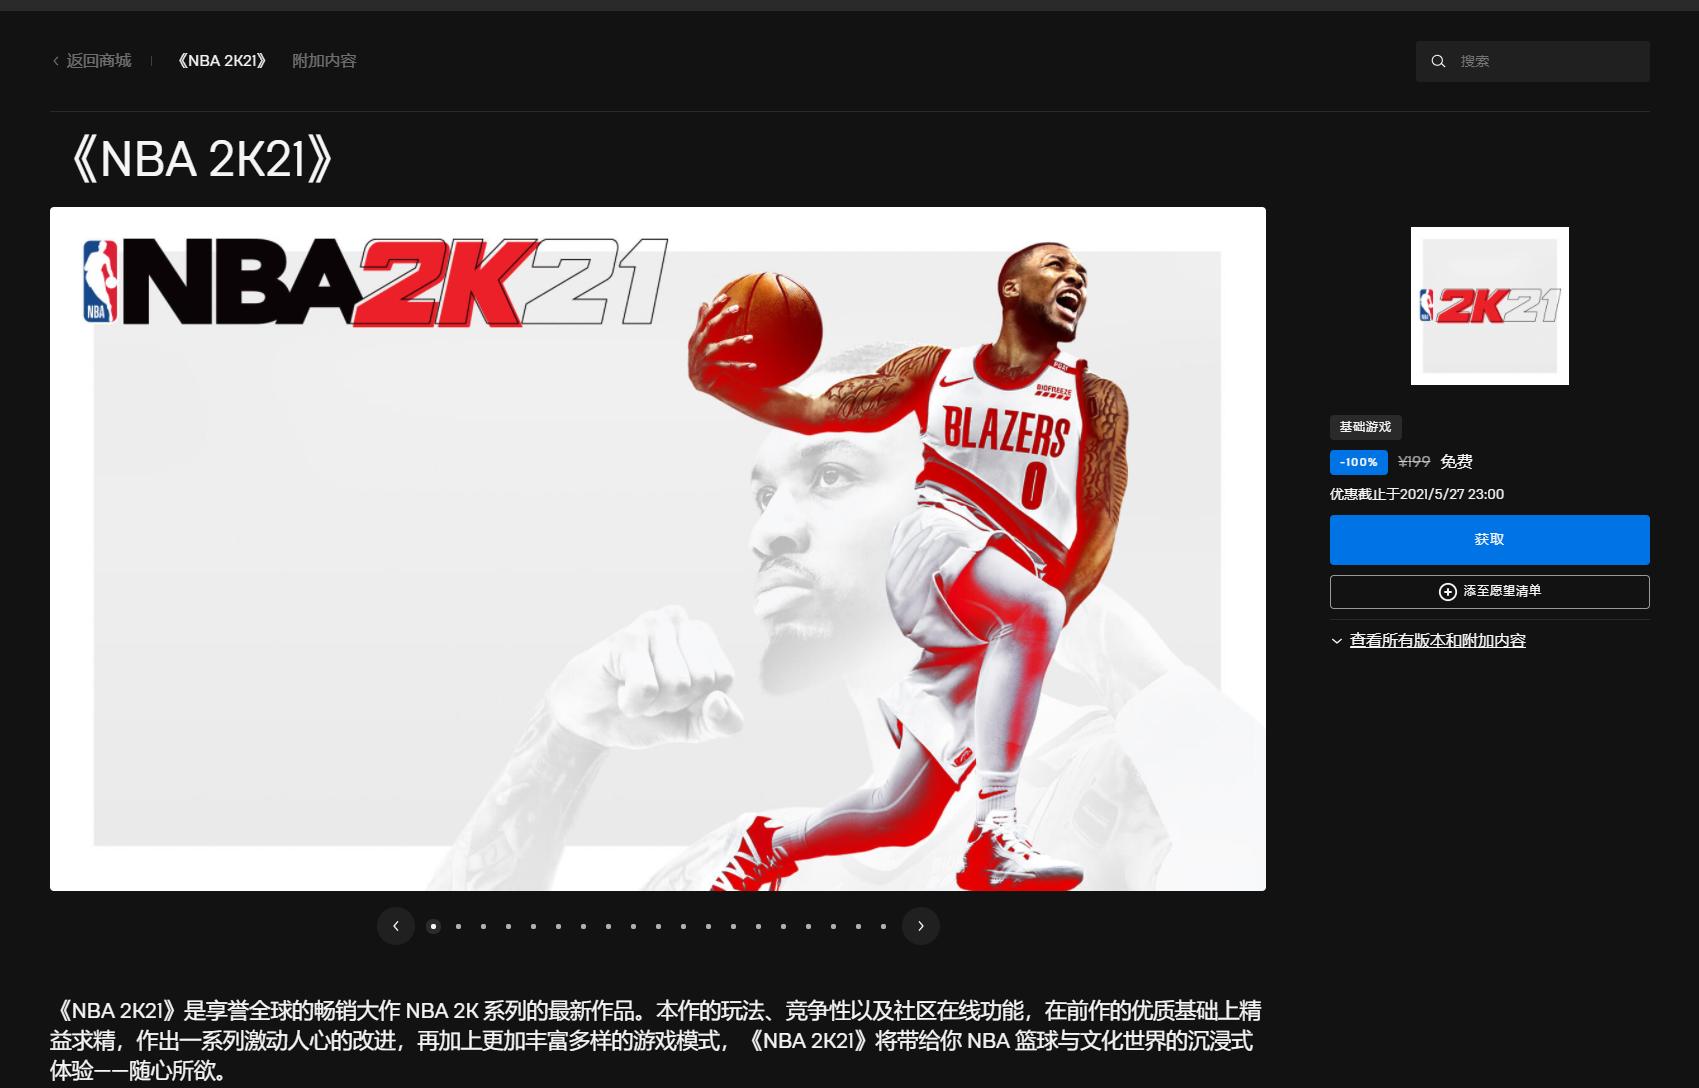 Epic商城免费领取游戏:《NBA2K21》好家伙,速领